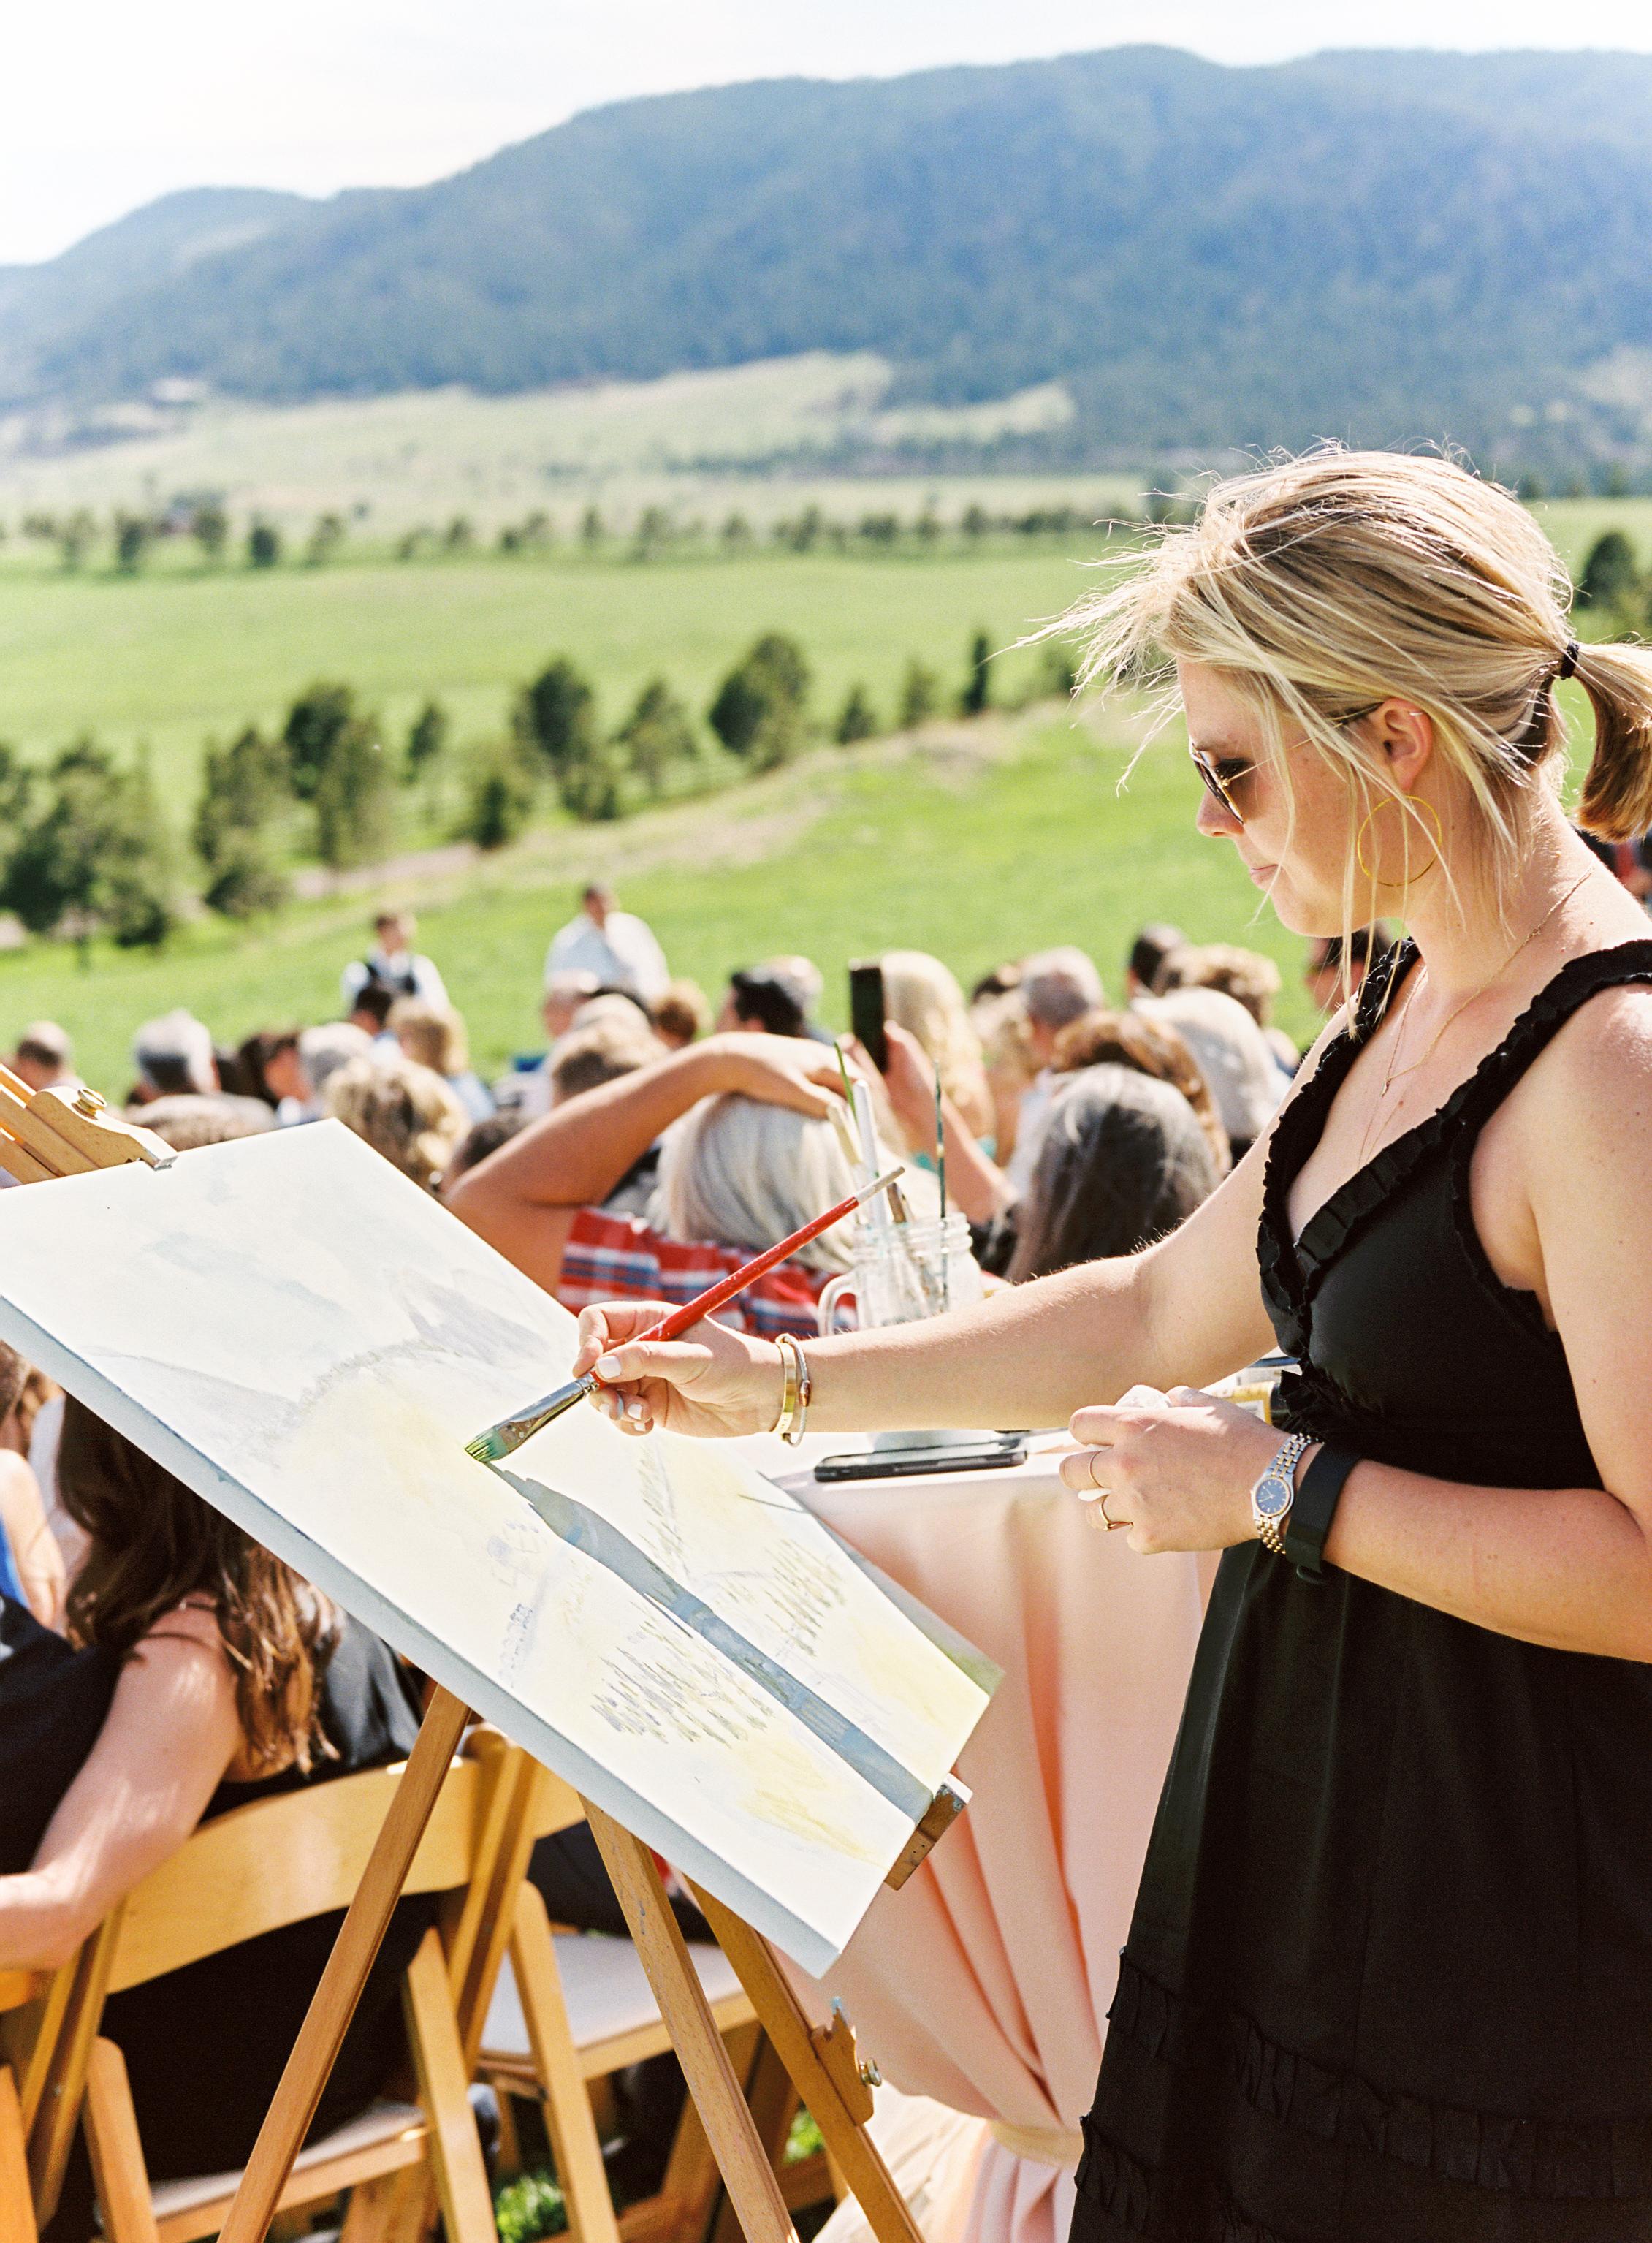 Kyle-Scott-Spruce-Mountain-wedding-by-Lisa-O'Dwyer-441.jpg